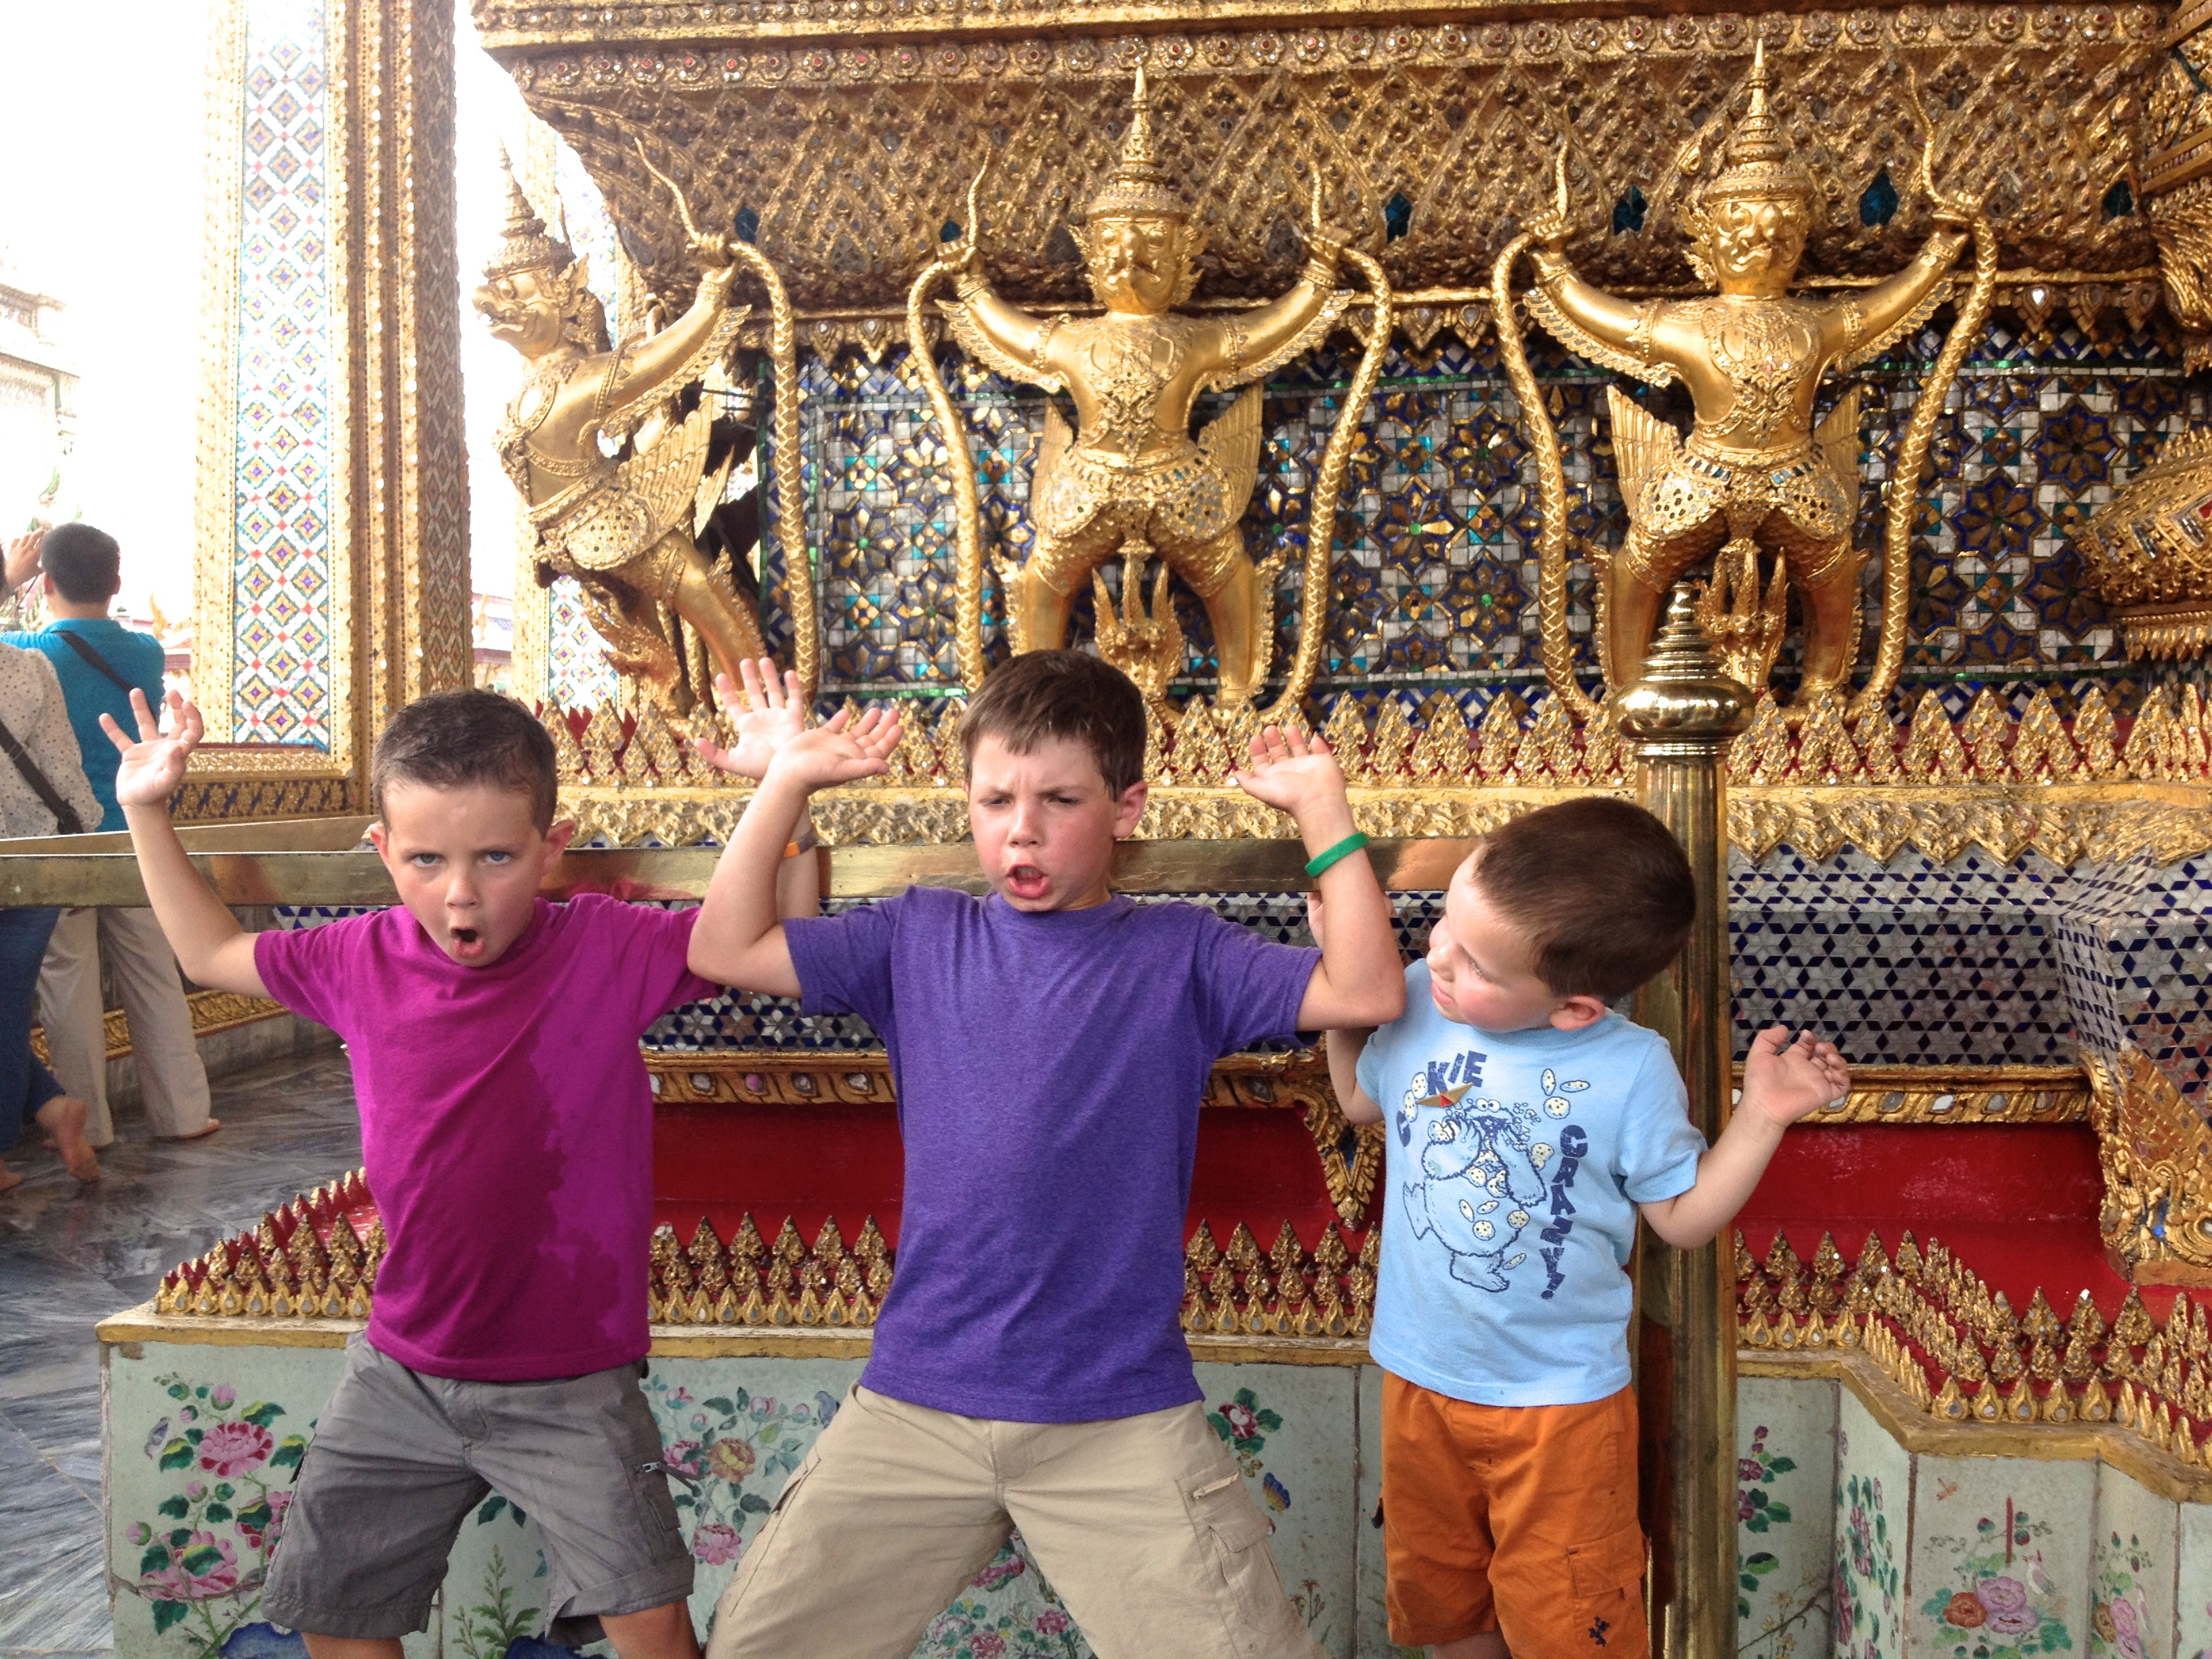 Columnist Kat Dayton's three sons at the  Grand Palace in Bangkok, Thailand, June 2013 | Photo by Kat Dayton, St. George News